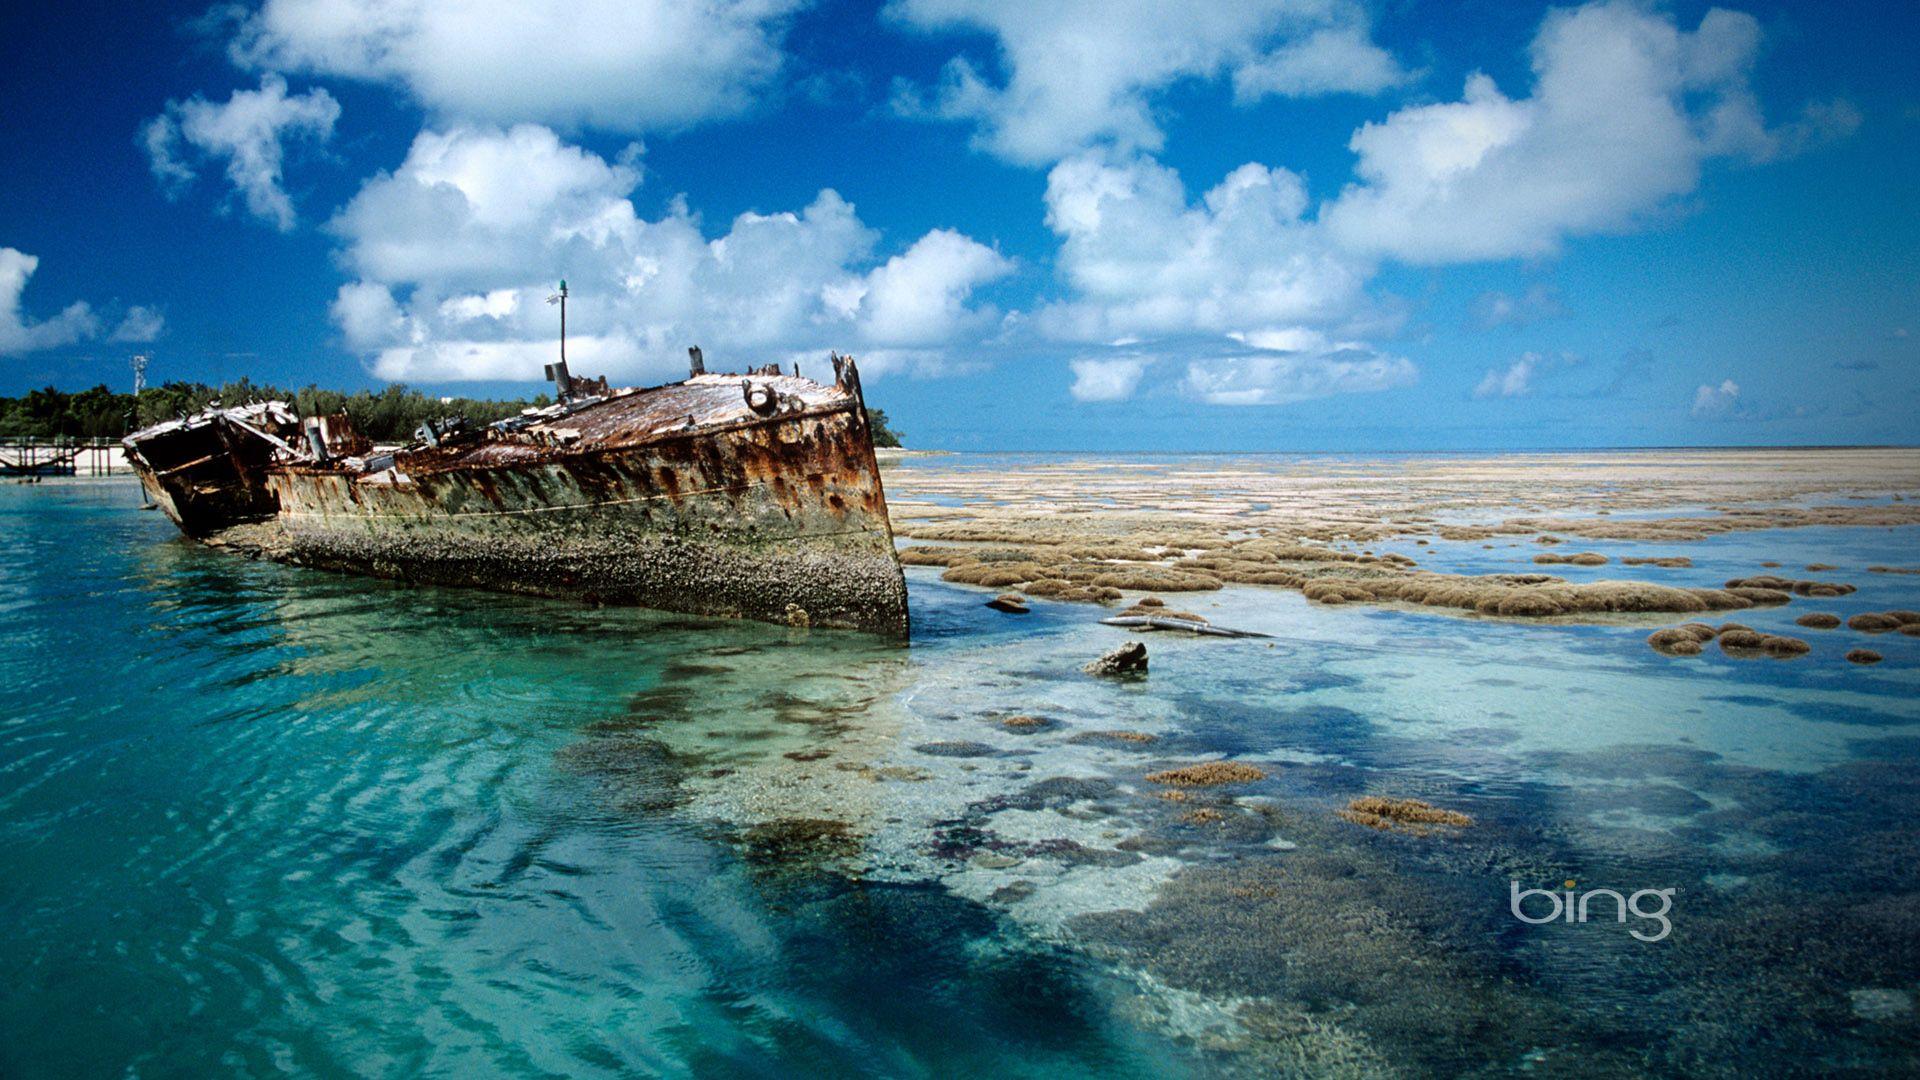 bing pictures desktop background Bing Shipwreck on Heron Island